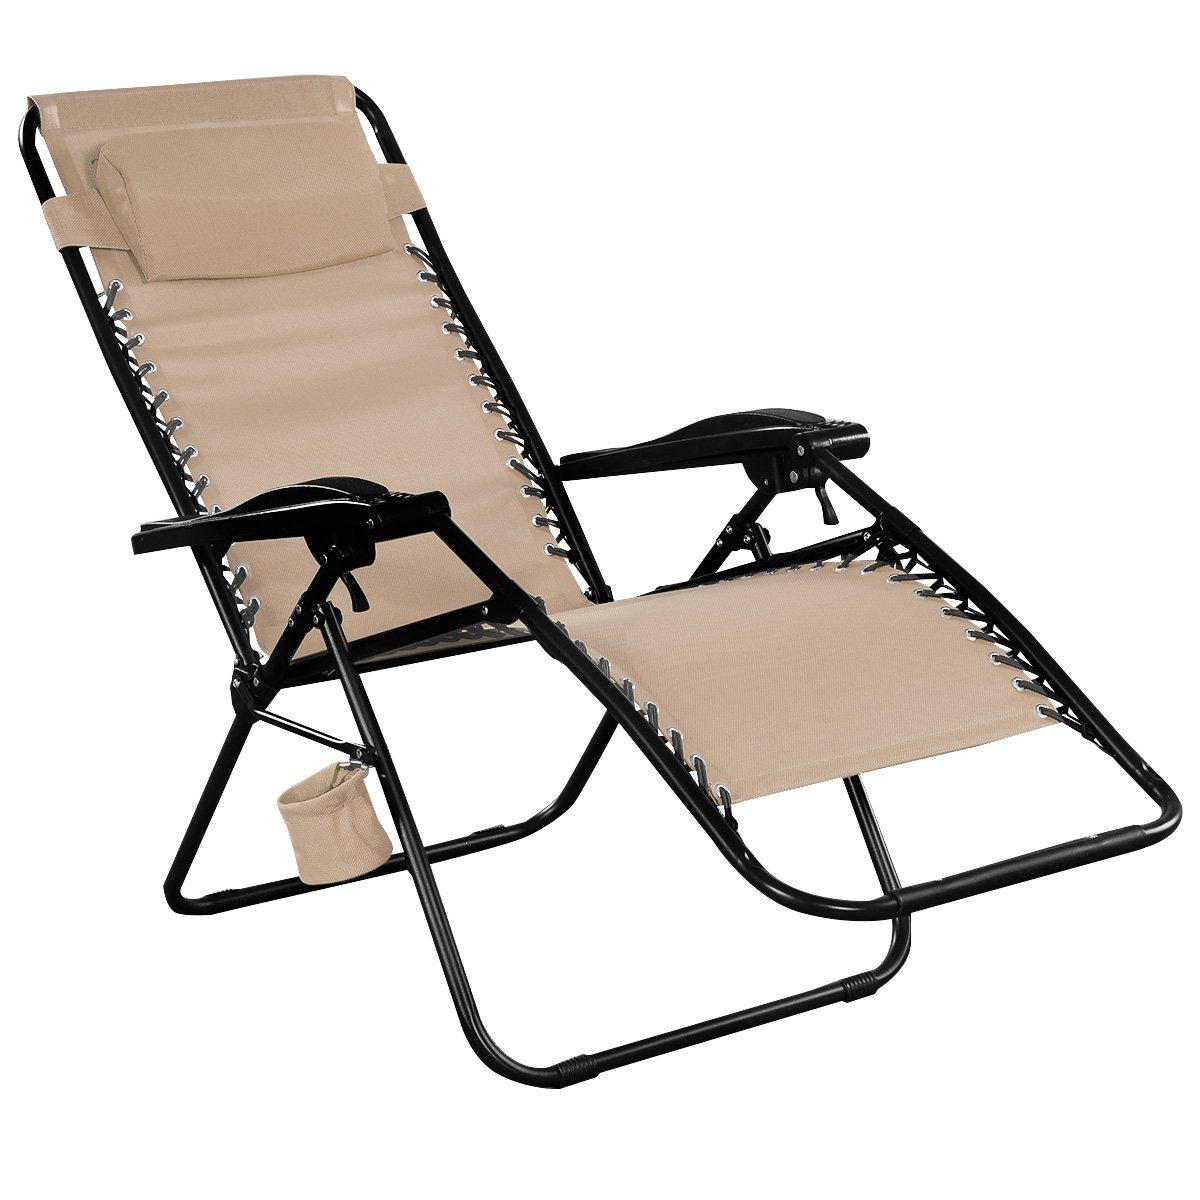 Giantex Light Brown Folding Zero Gravity Reclining Lounge Chairs Outdoor Beach Patio Yard New